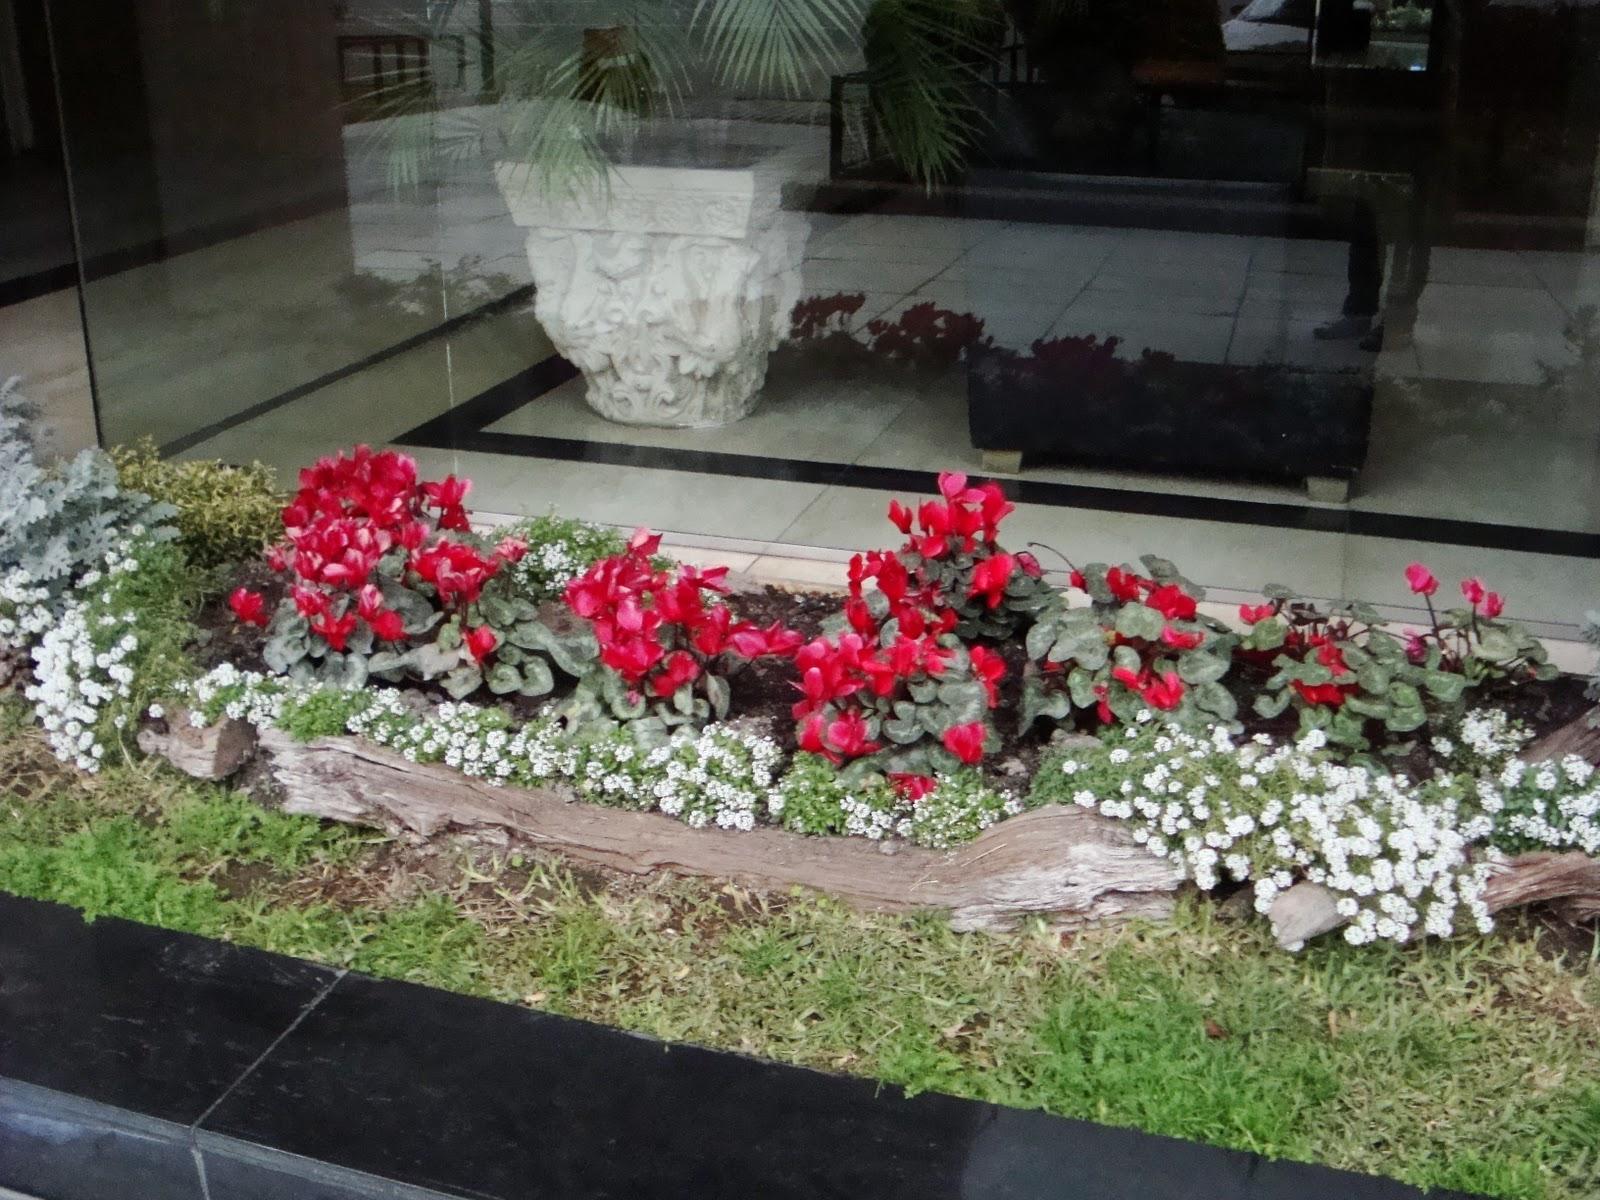 plantas jardim tipos:Tipos de flores para jardim interno e de inverno